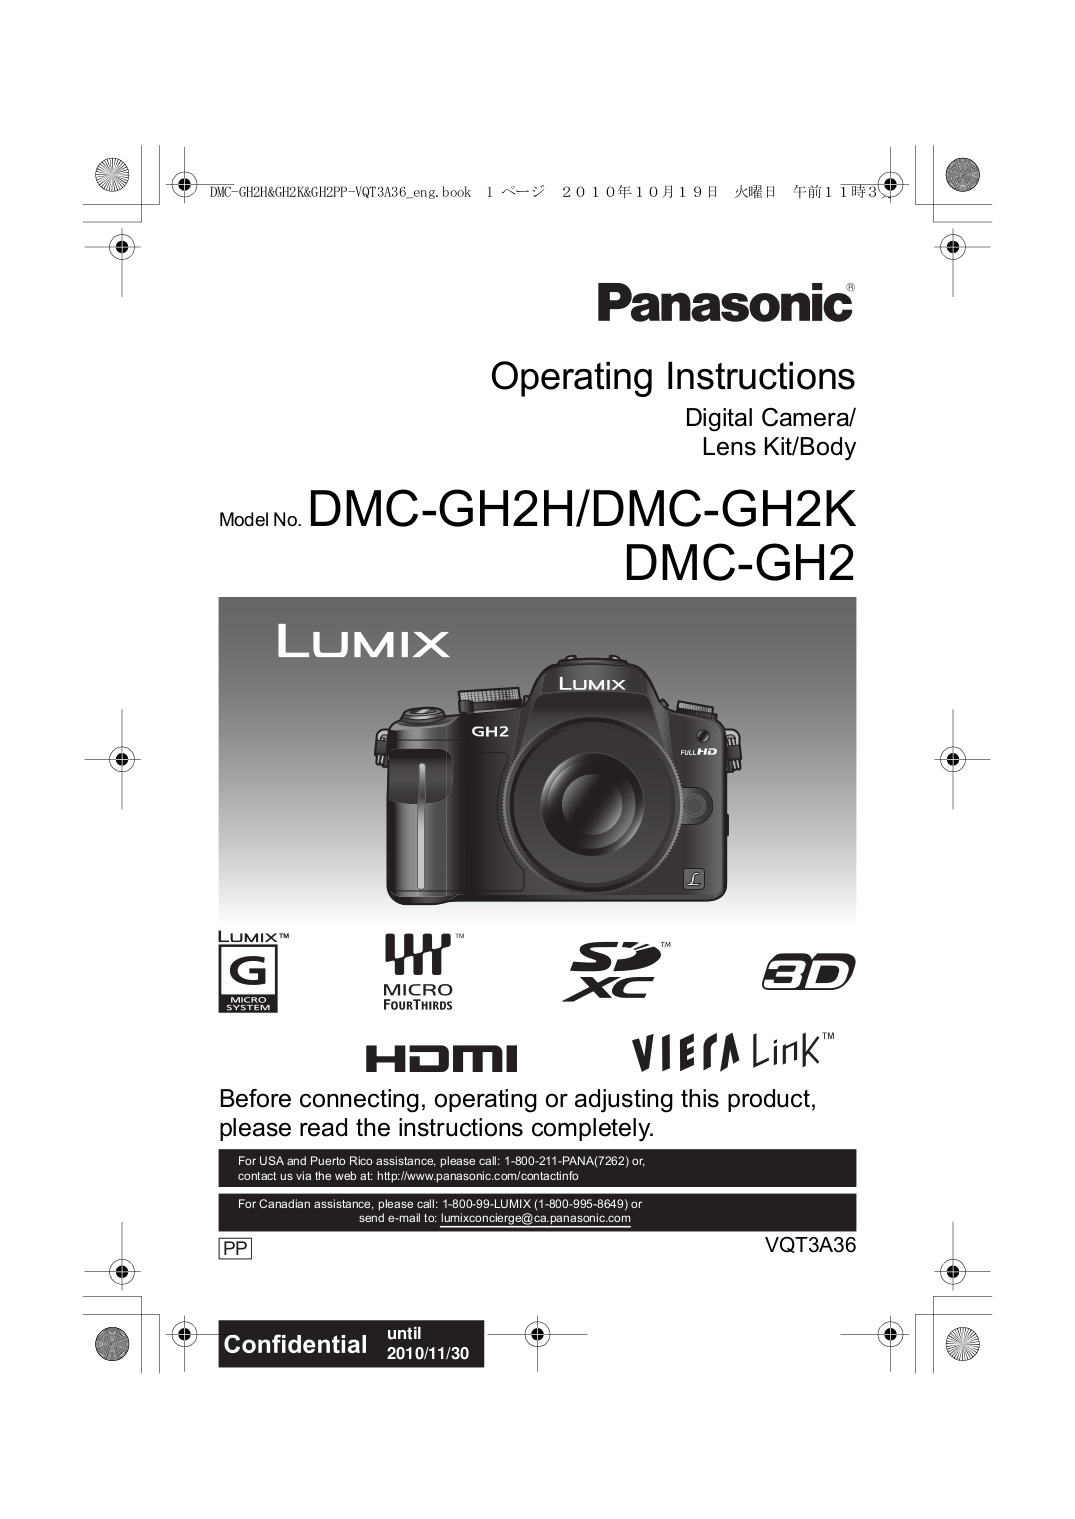 download free pdf for panasonic lumix dmc gf1 digital camera manual rh umlib com panasonic dmc-gf1 manual Panasonic Lumix LF1 Camera